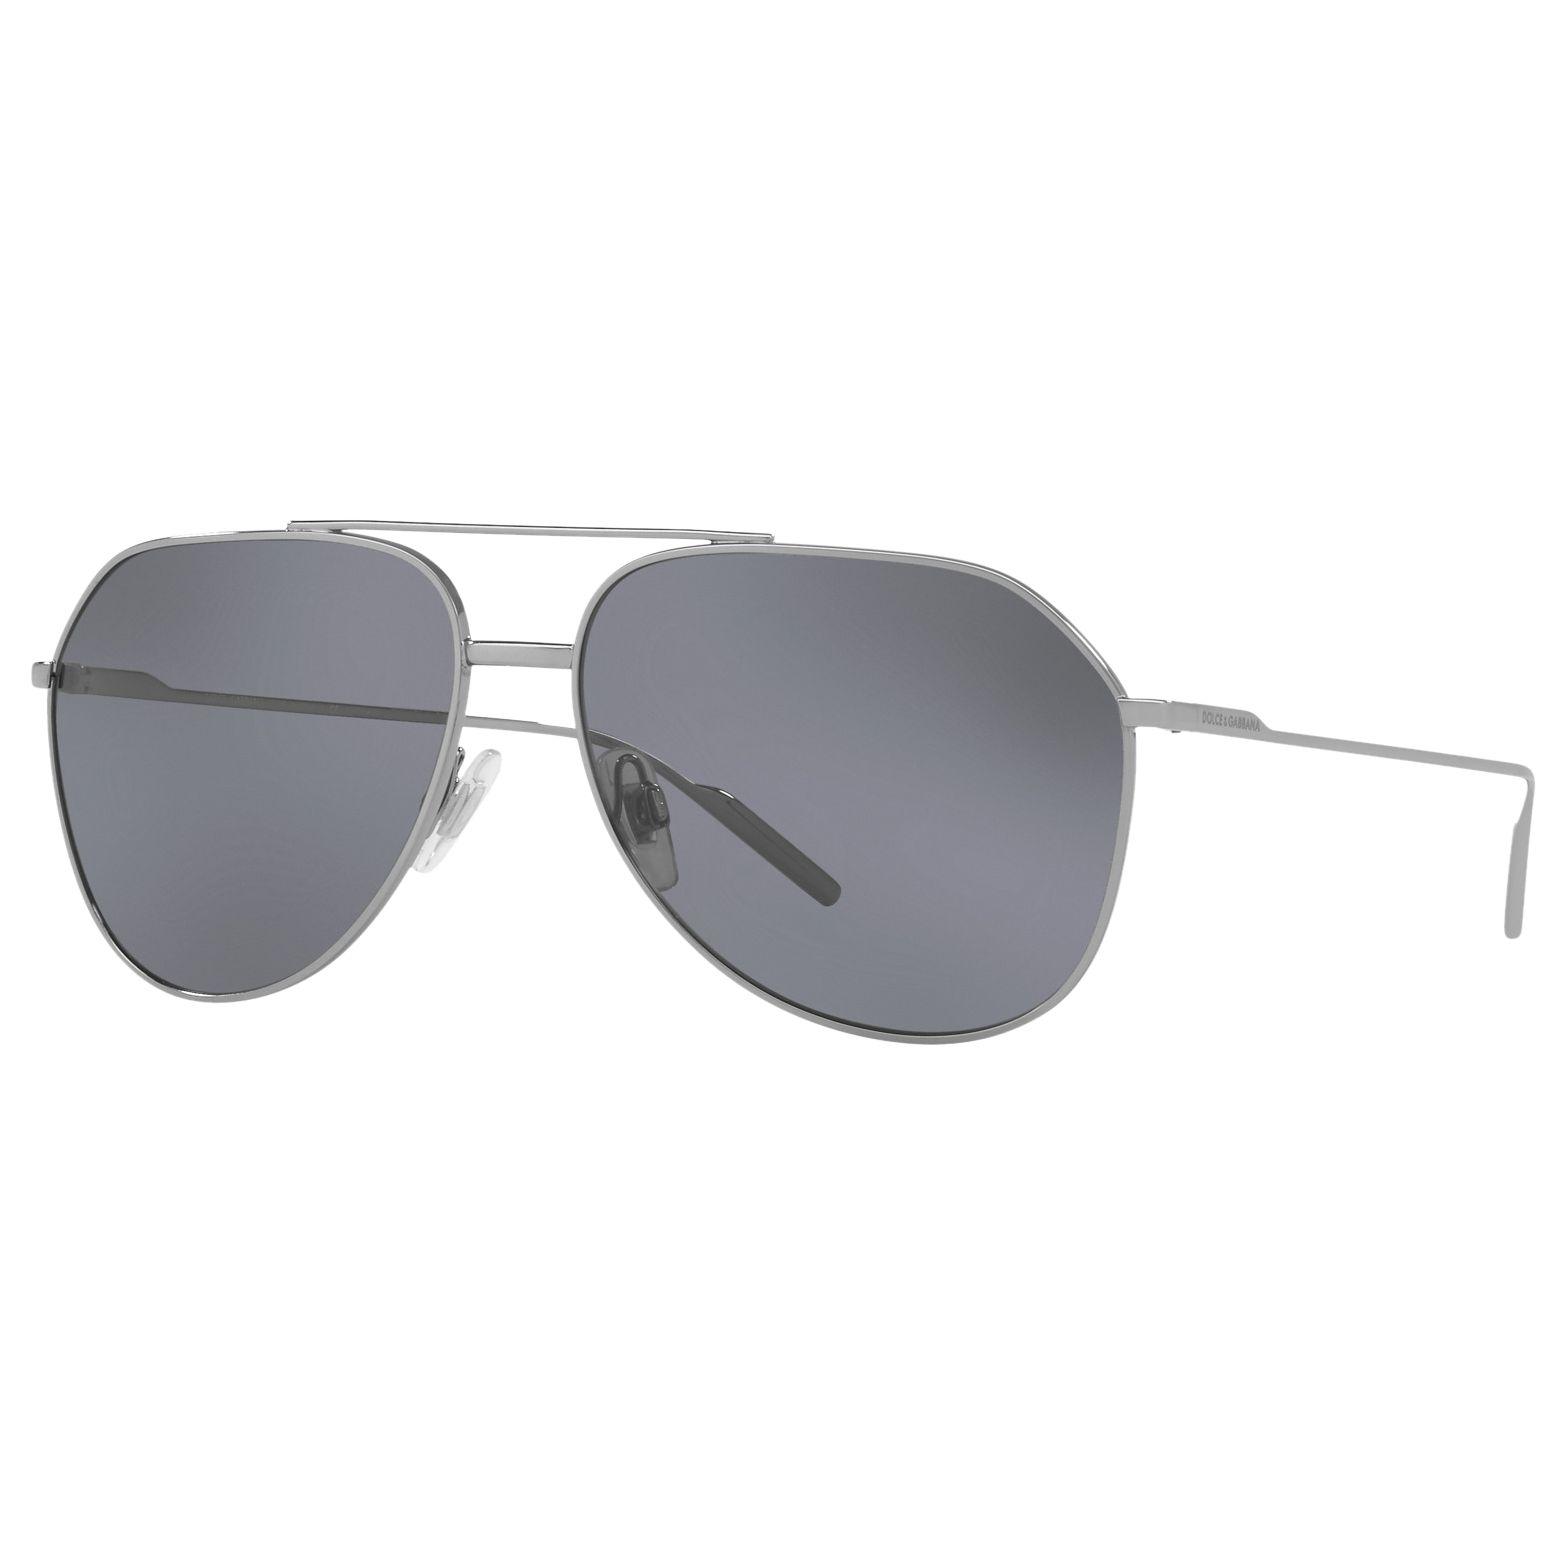 Dolce & Gabbana Dolce & Gabbana DG2166 Polarised Aviator Sunglasses